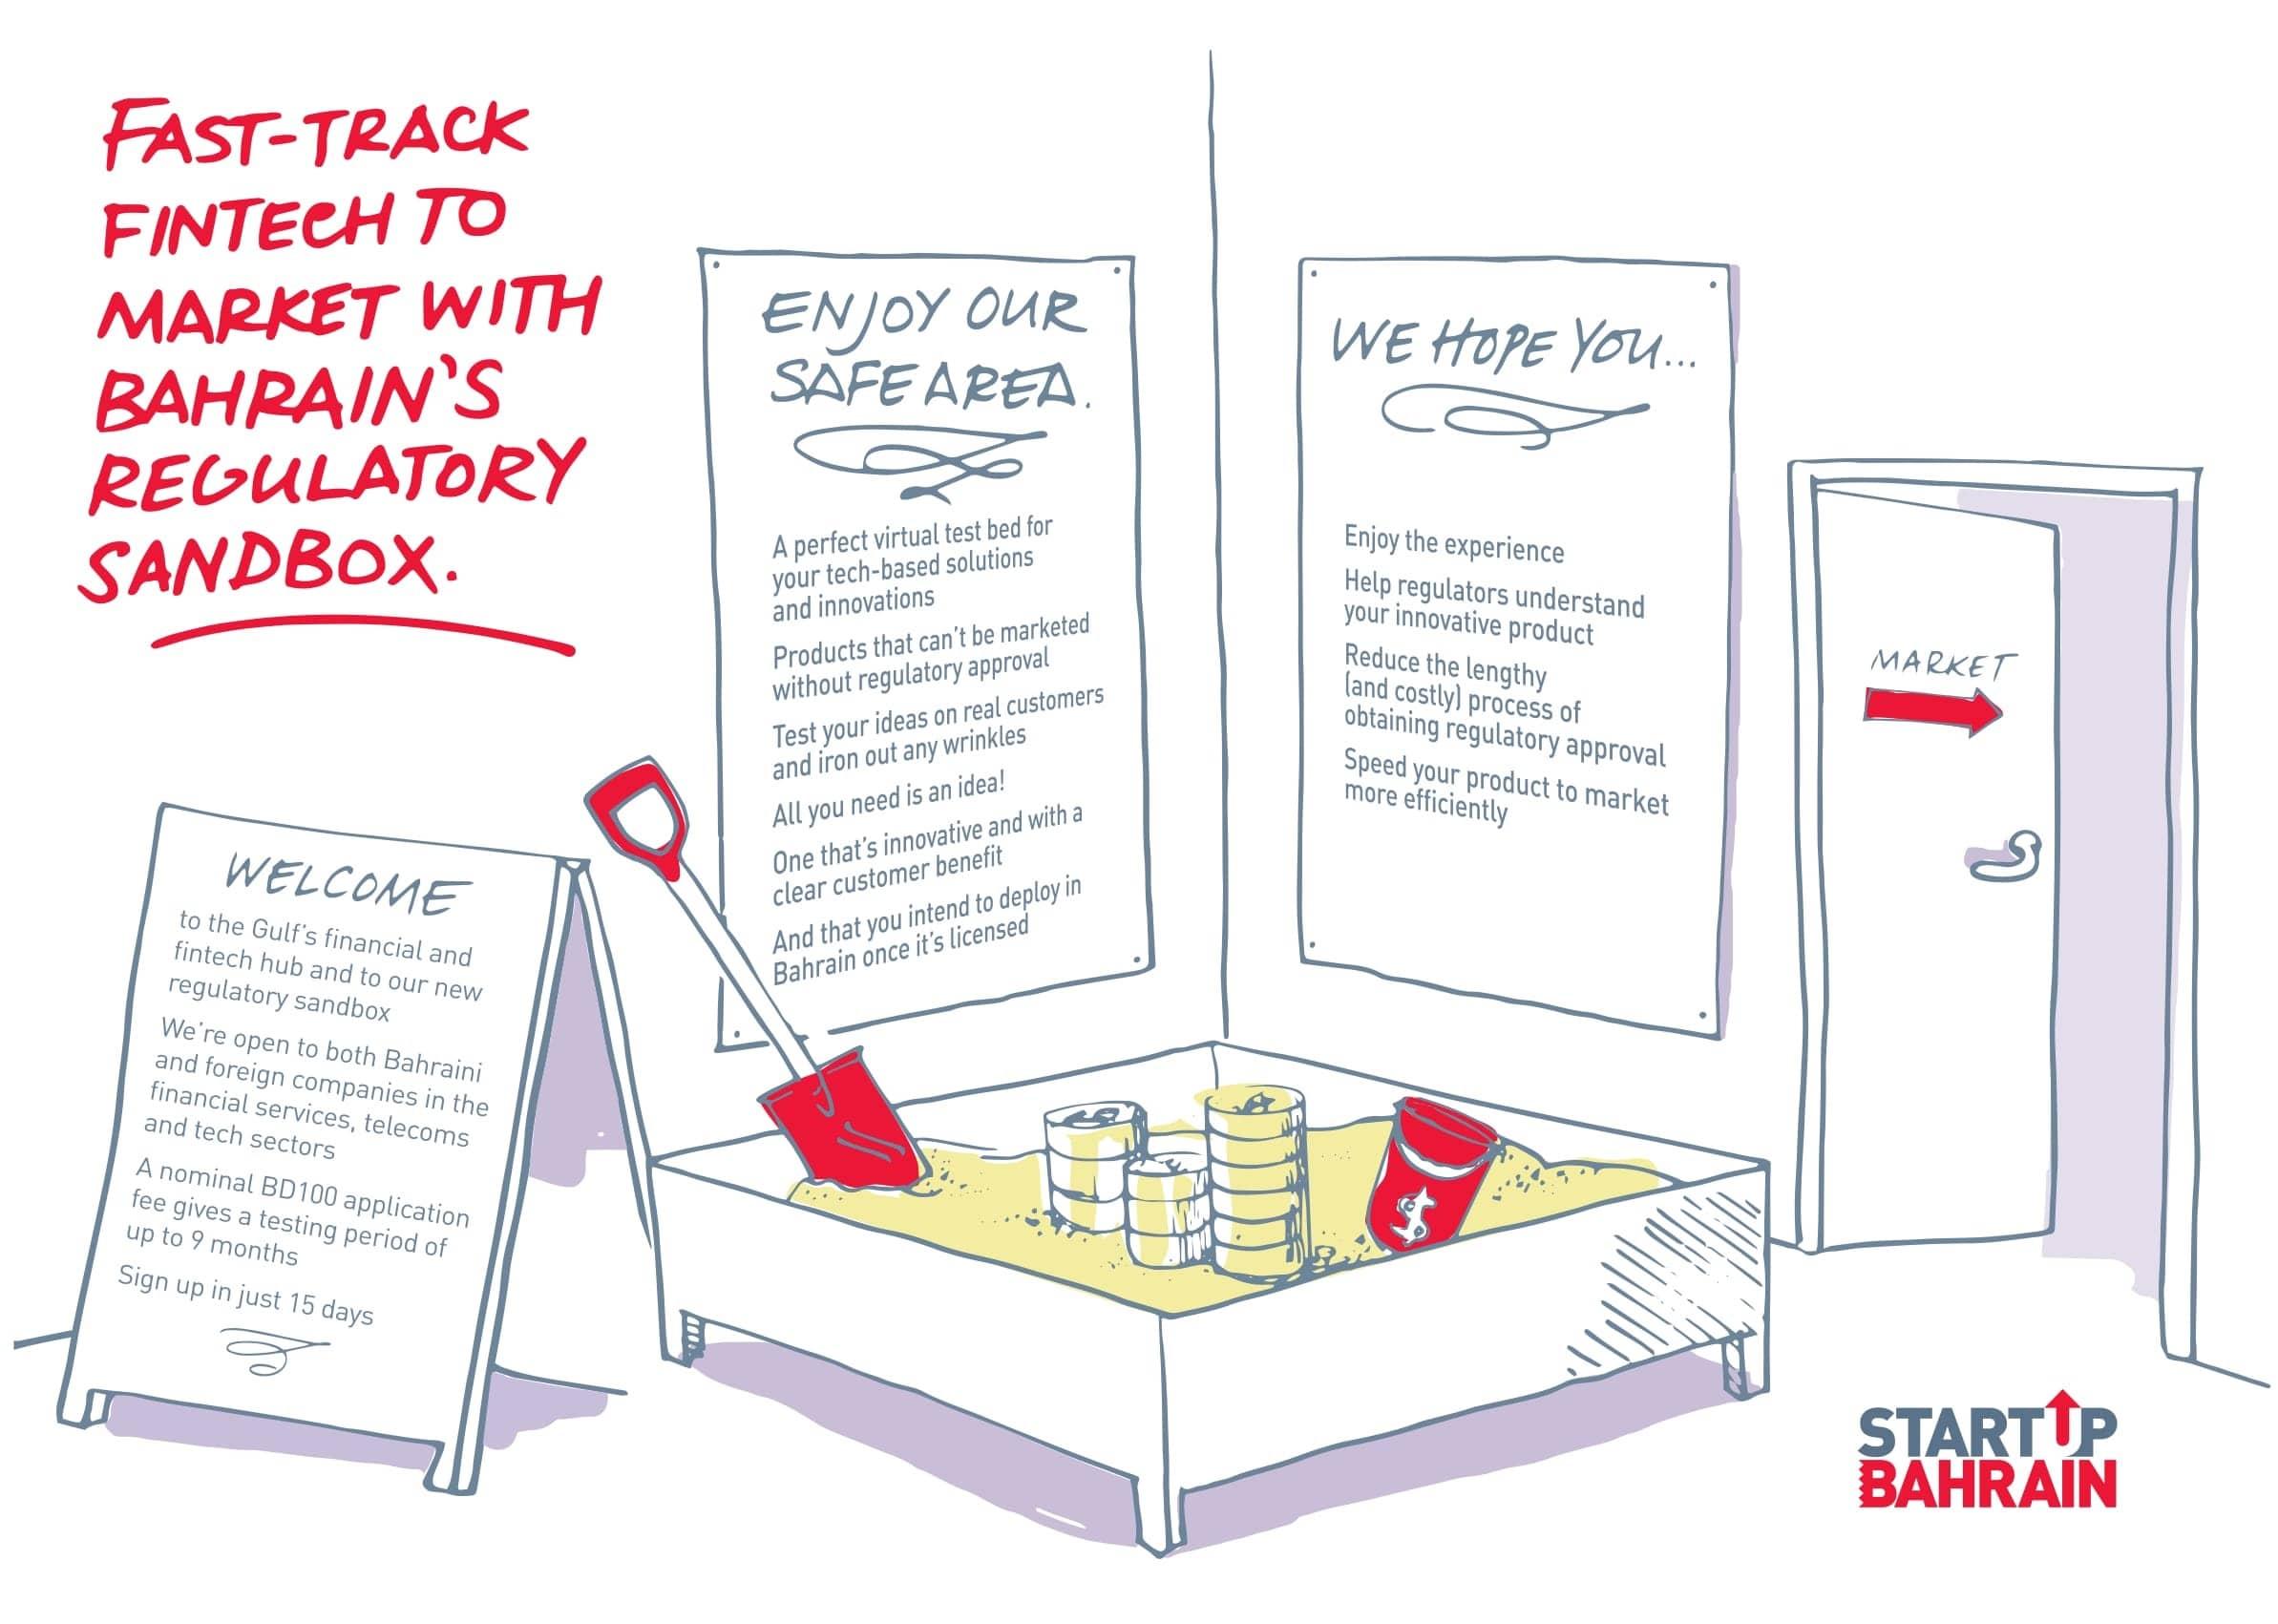 Central Bank of Bahrain Announces Landmark Regulatory Sandbox for Fintech Startups